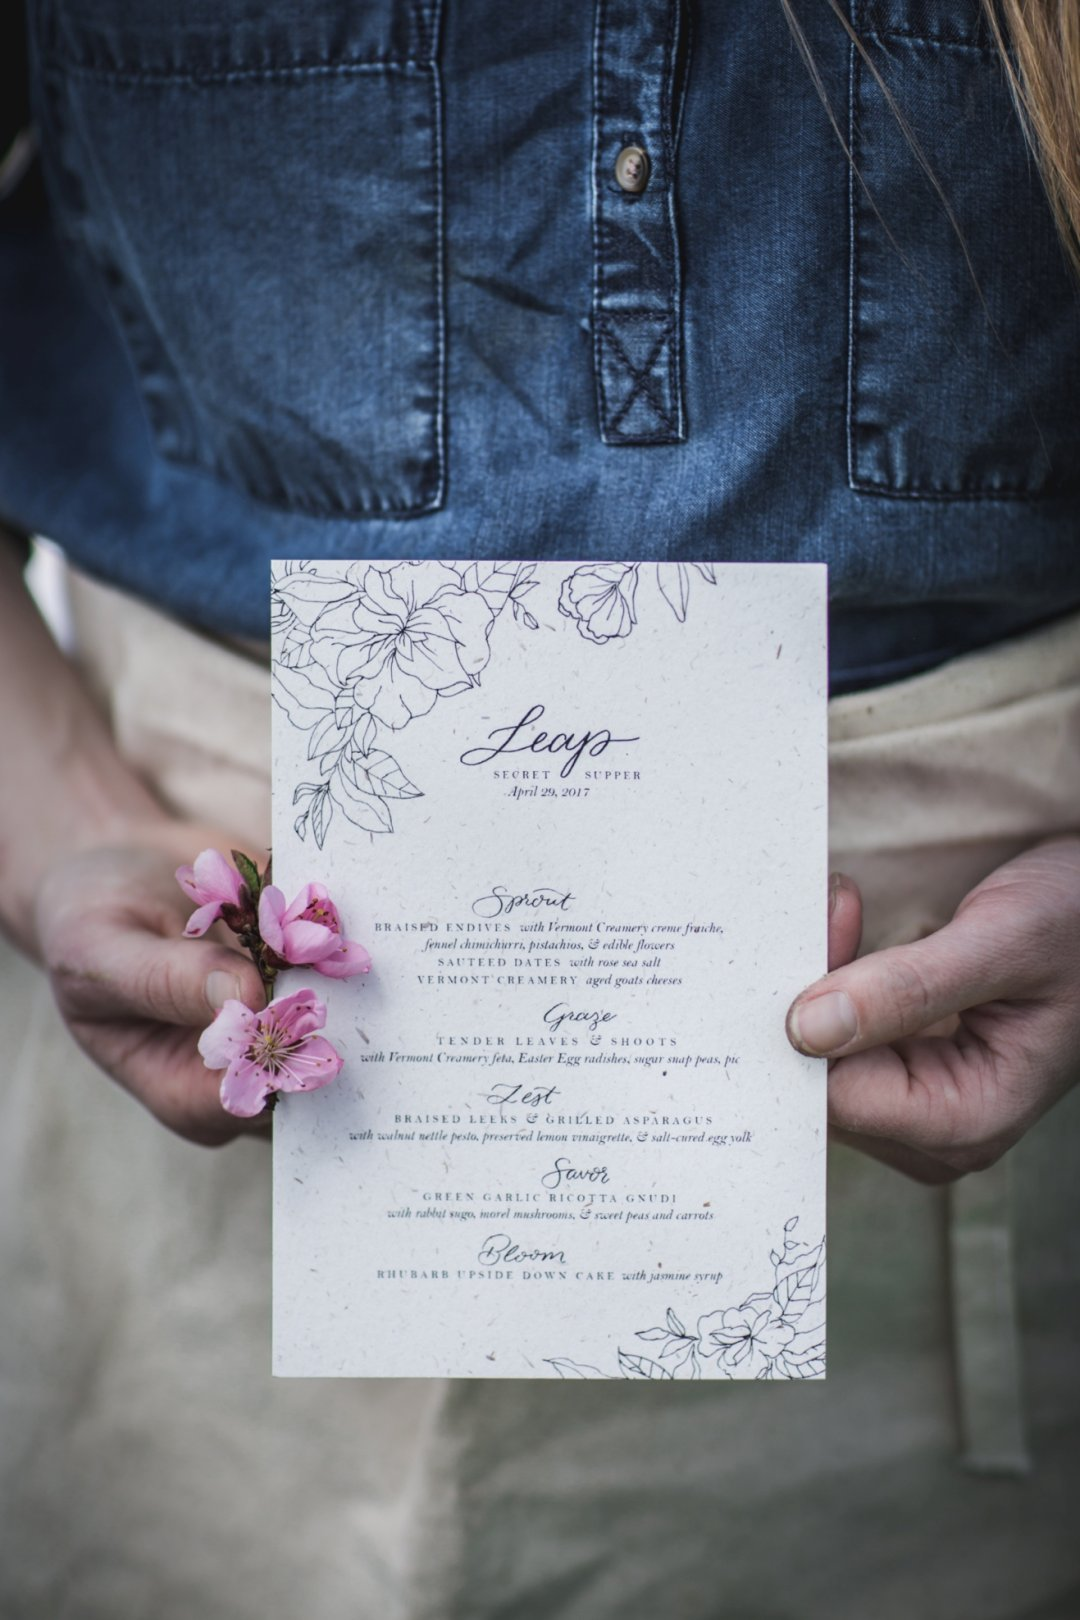 Woman's hands holding supper menu